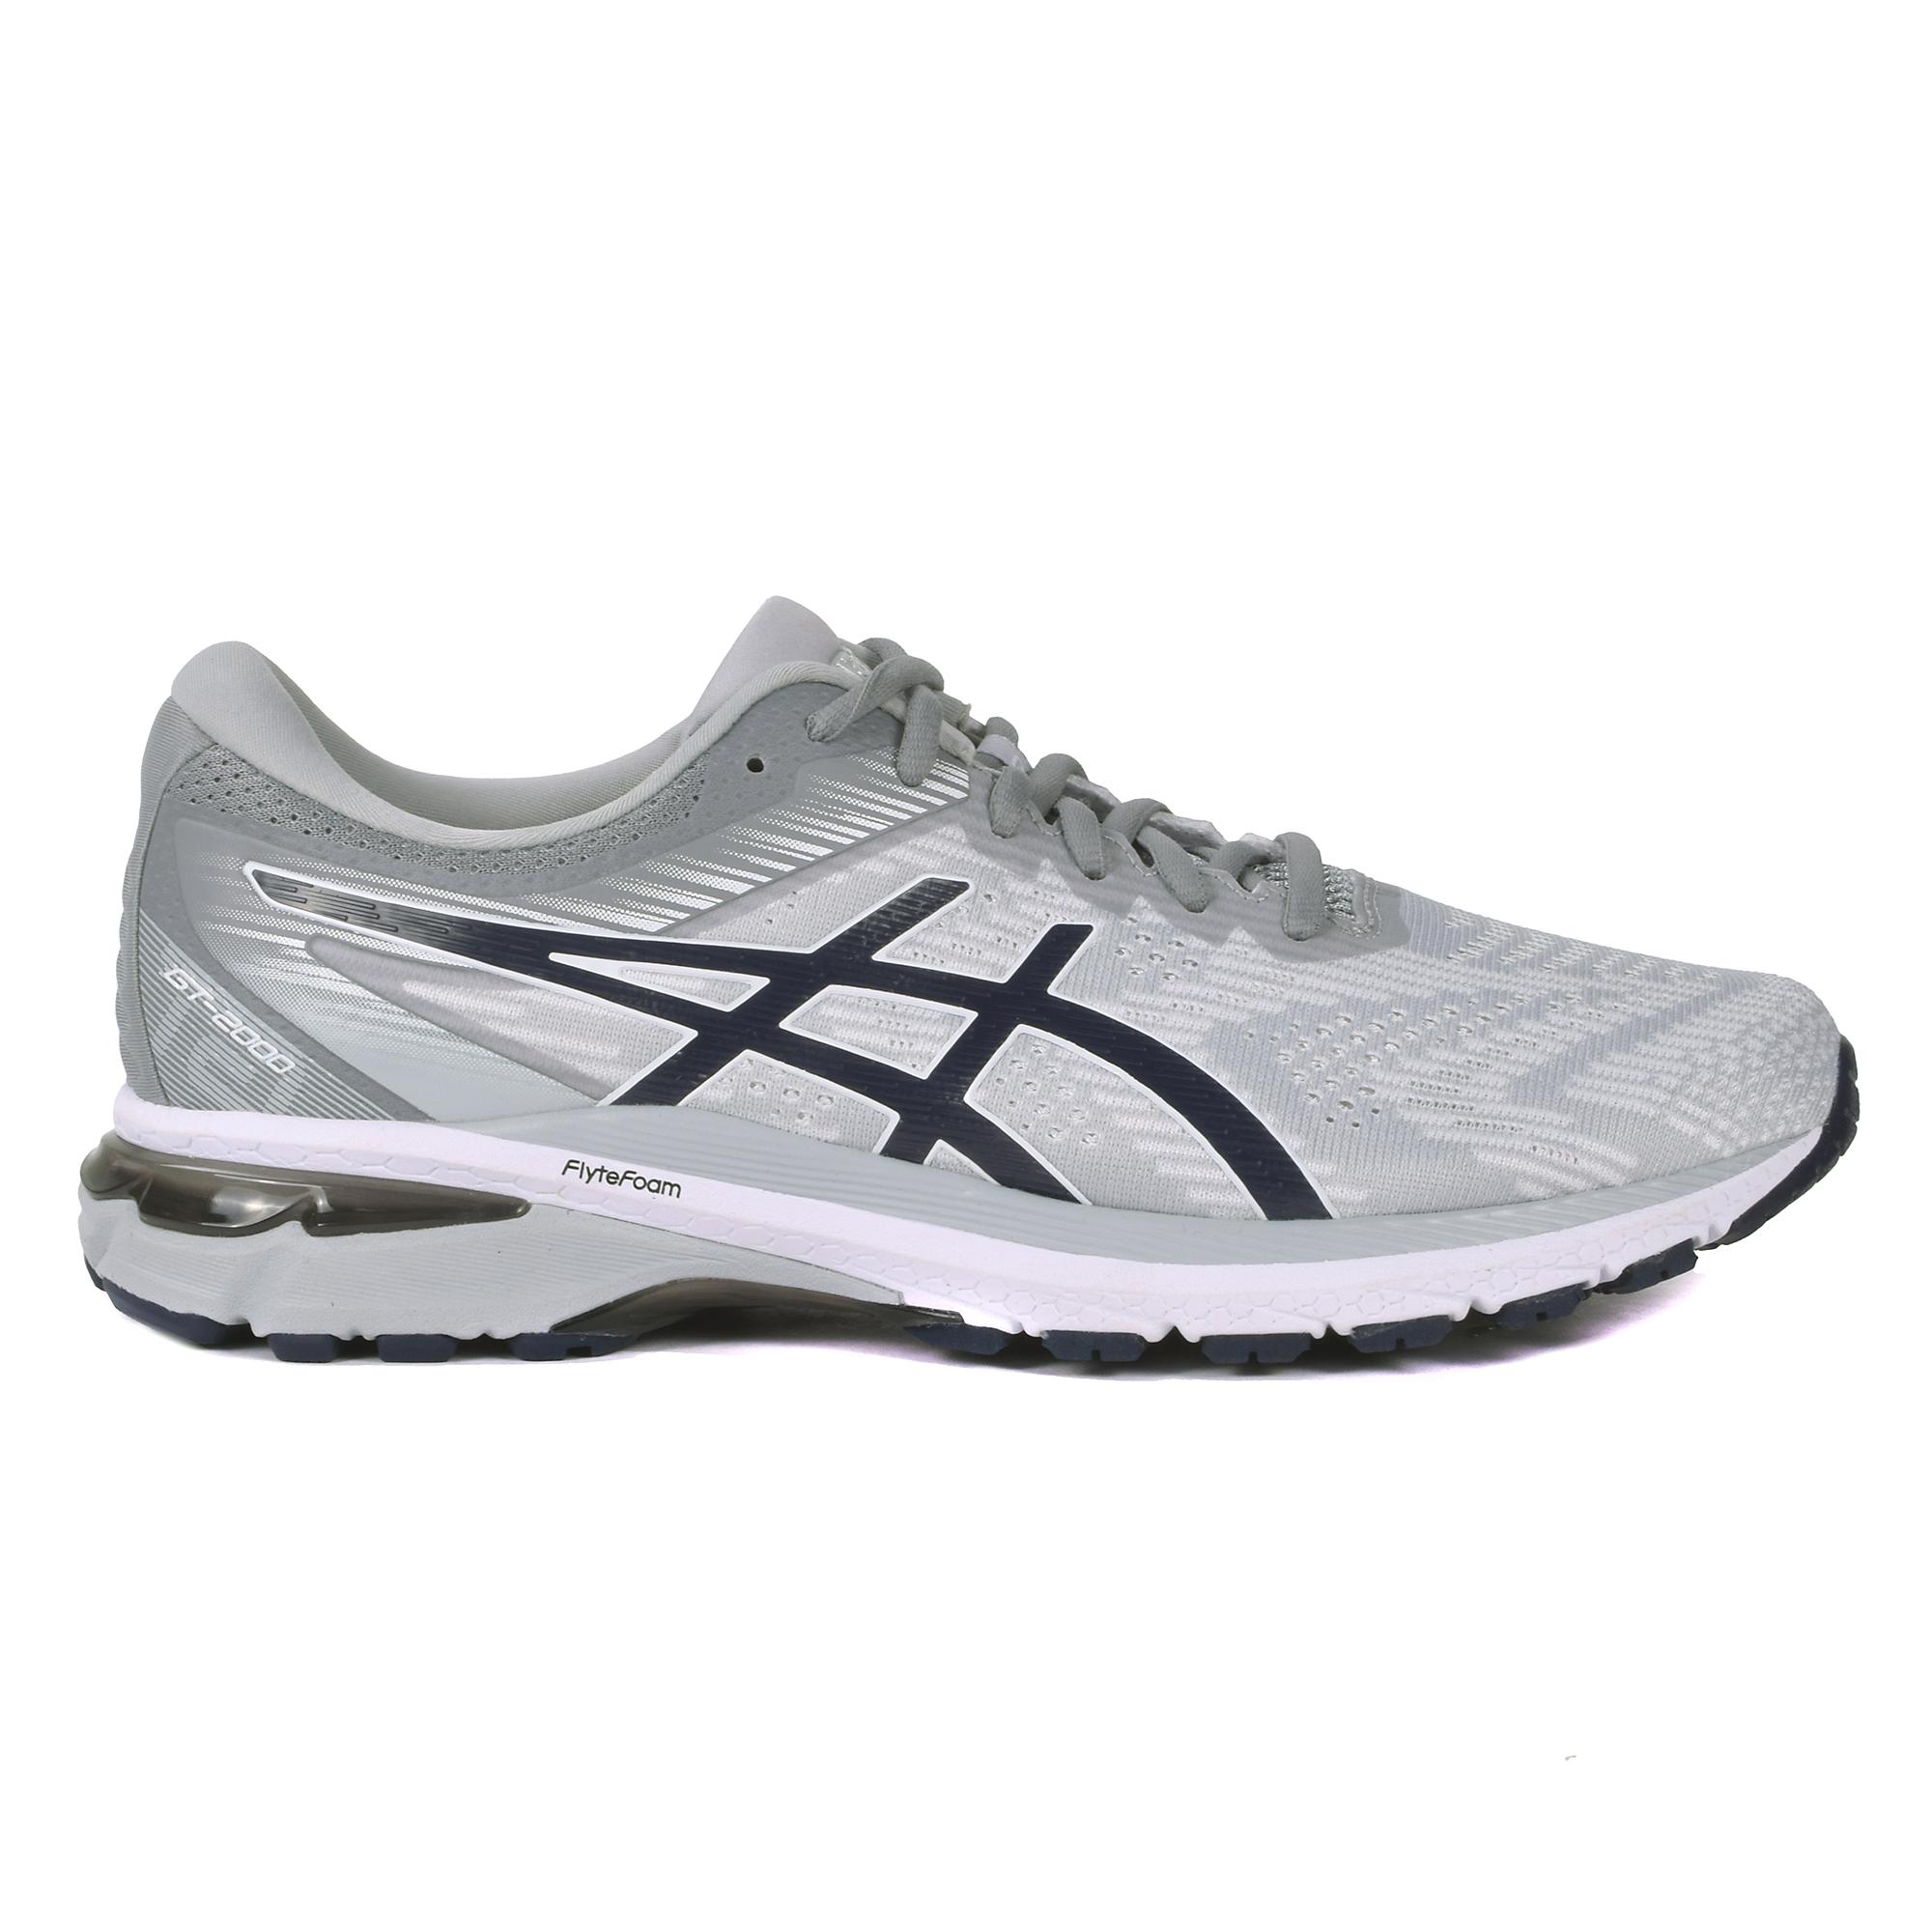 Men's Asics Gt-2000 8 Running Shoe - Color: Piedmont Grey (Regular Width) - Size: 7, Grey, large, image 1